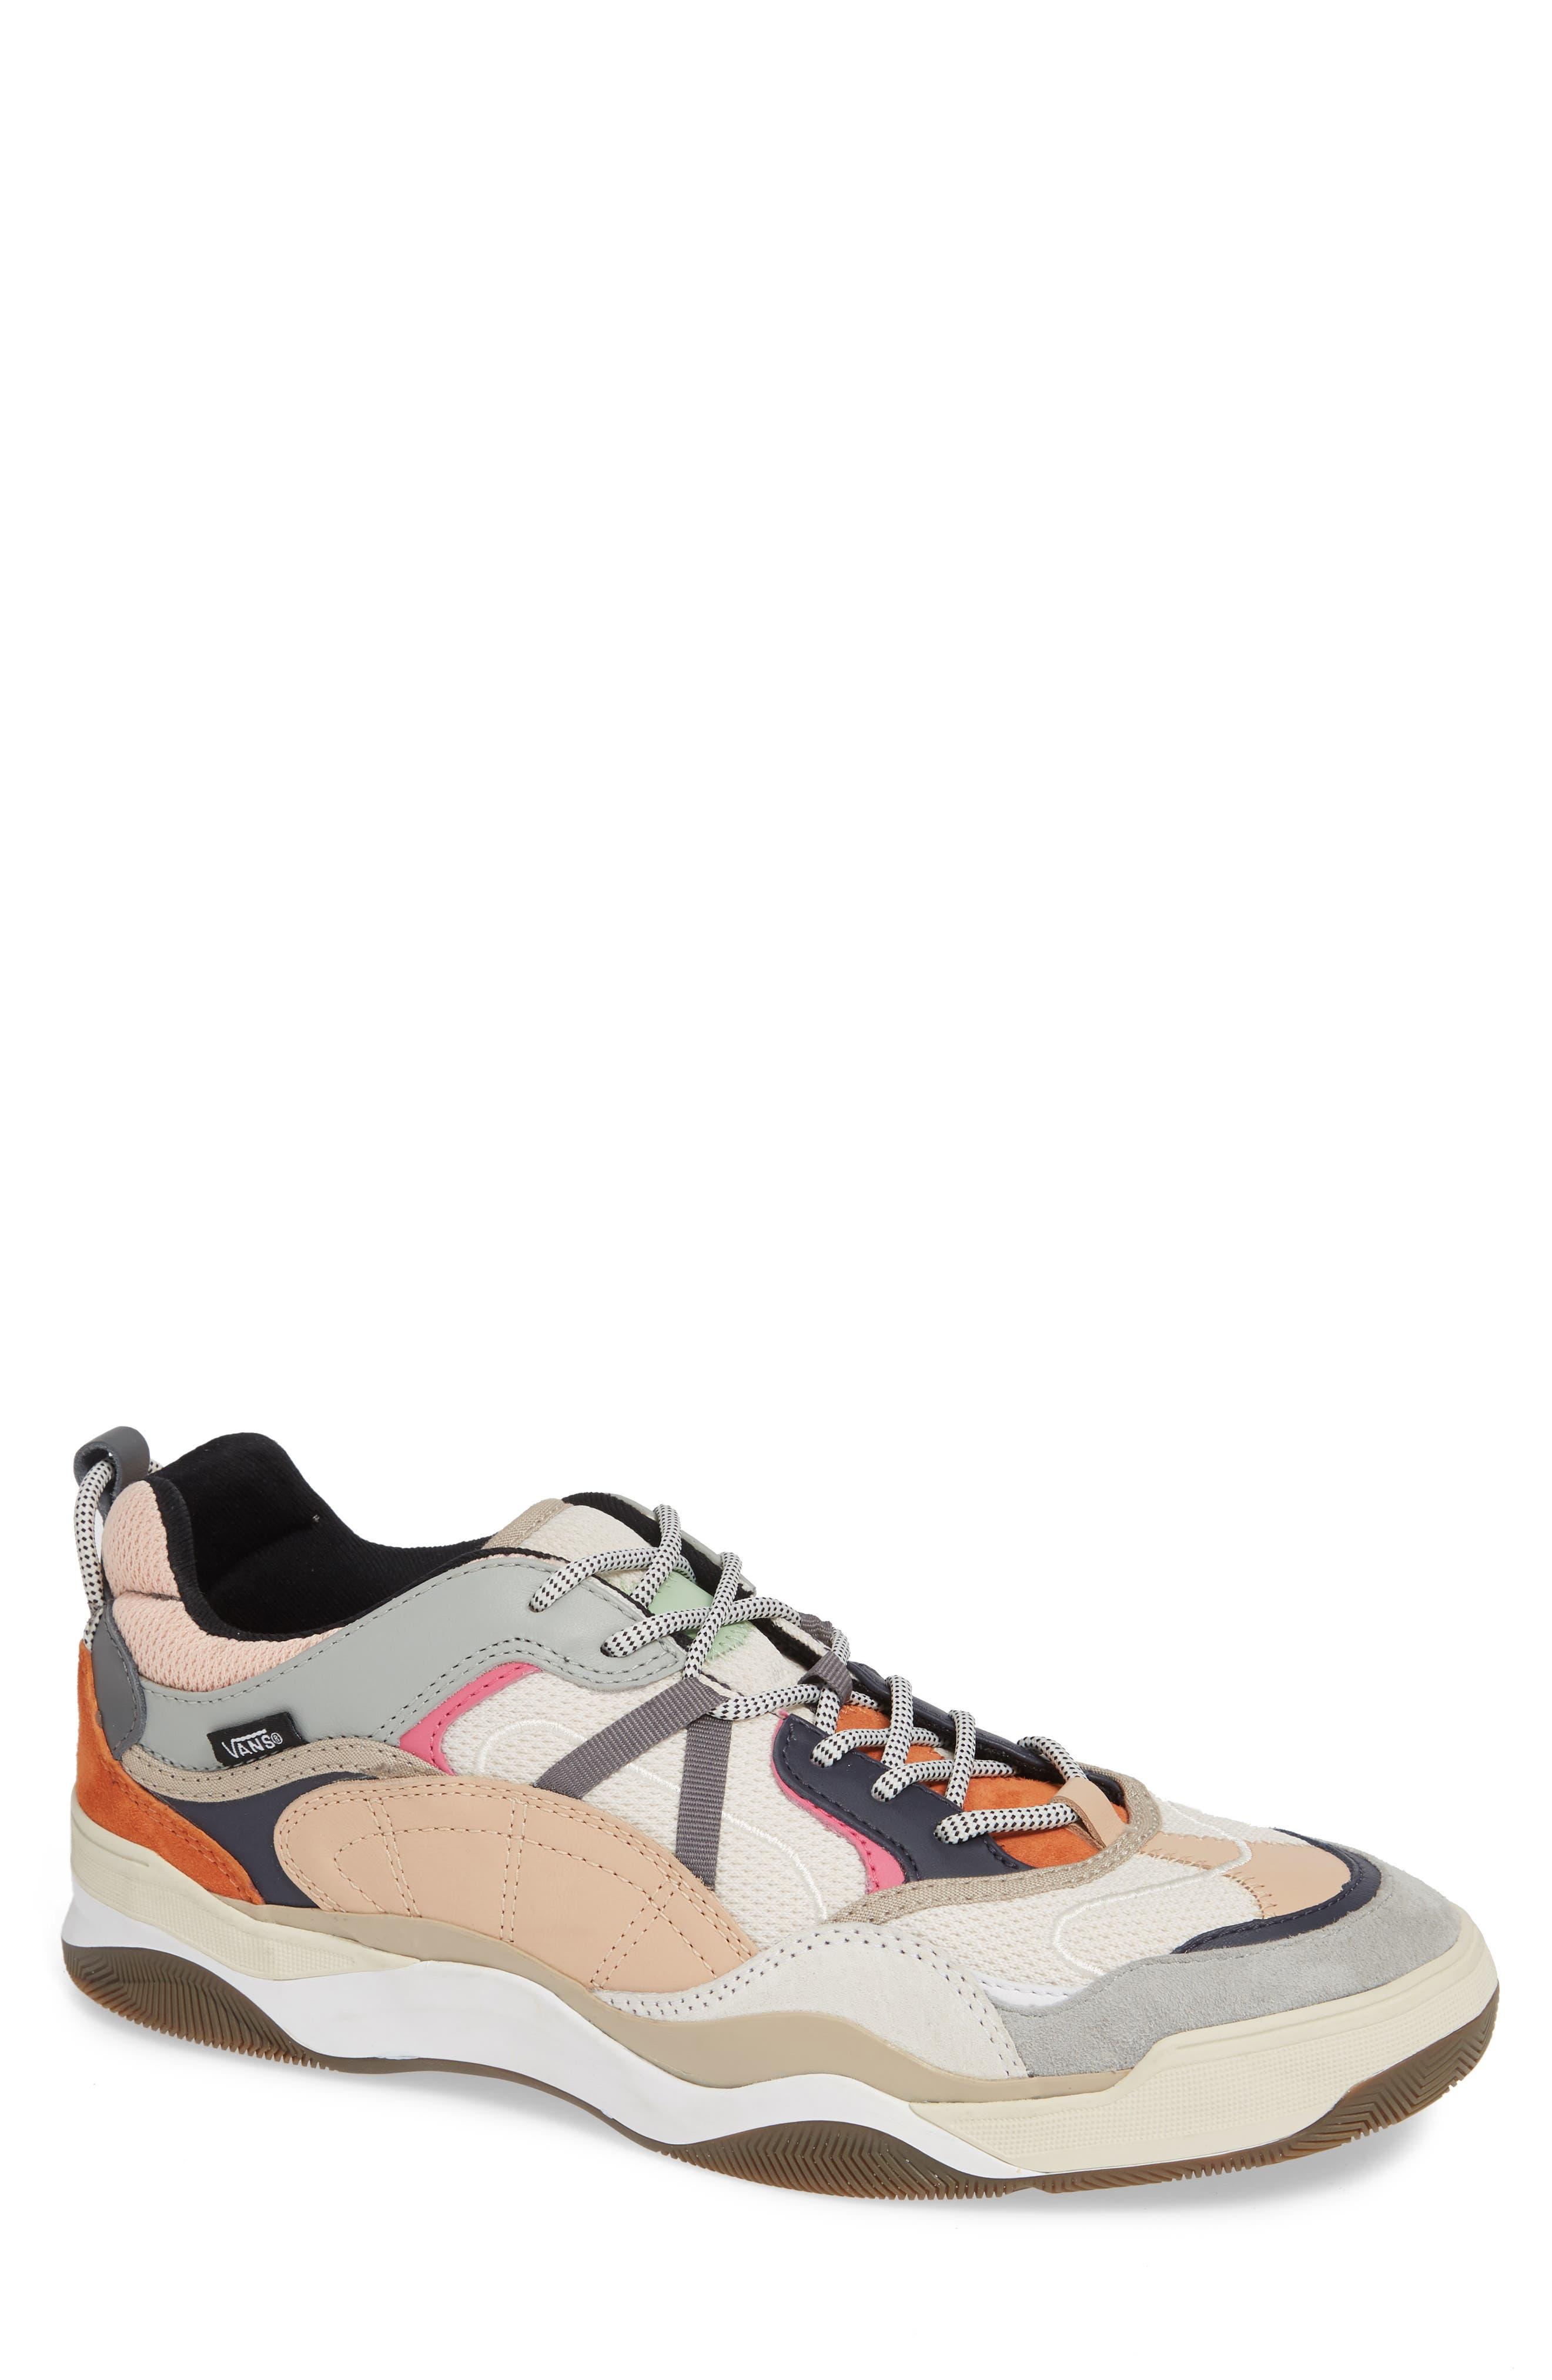 VANS Varix WC Sneaker, Main, color, TURTLEDOVE/ TRUE WHITE LEATHER